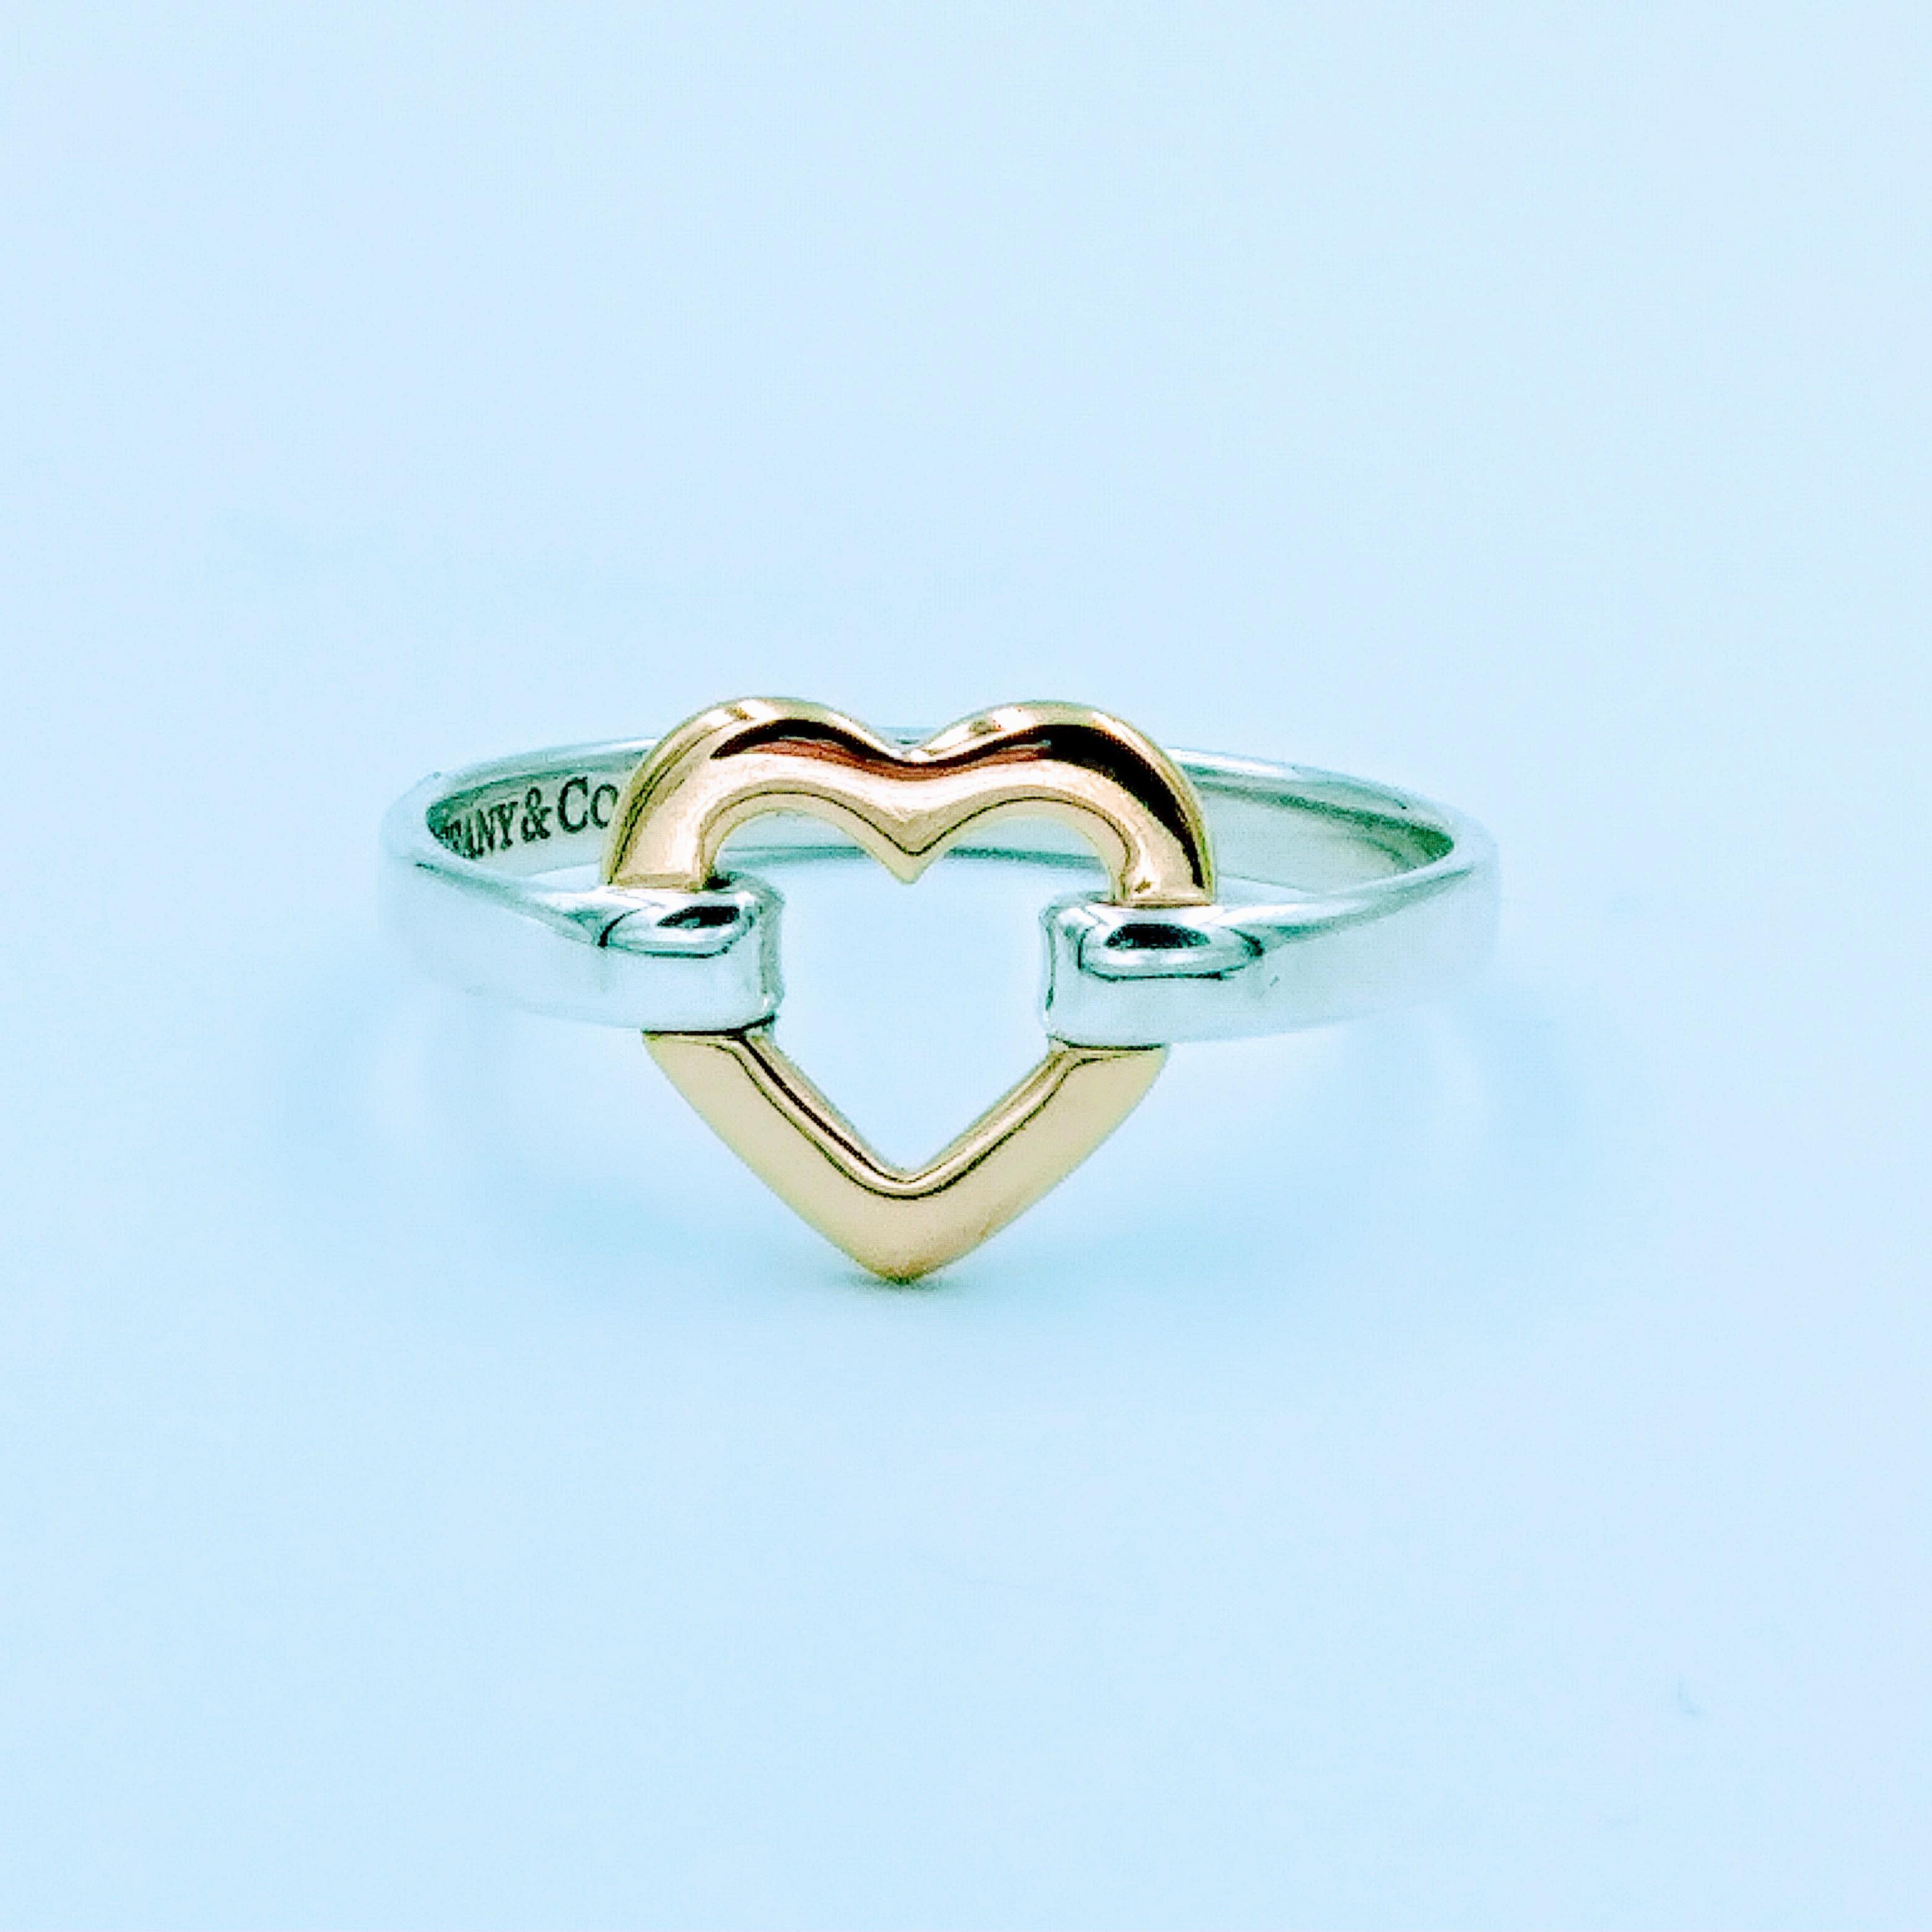 <b>Tiffany & Co.</b> 18k Gold Sterling Silver Open Heart Ring, Size 8